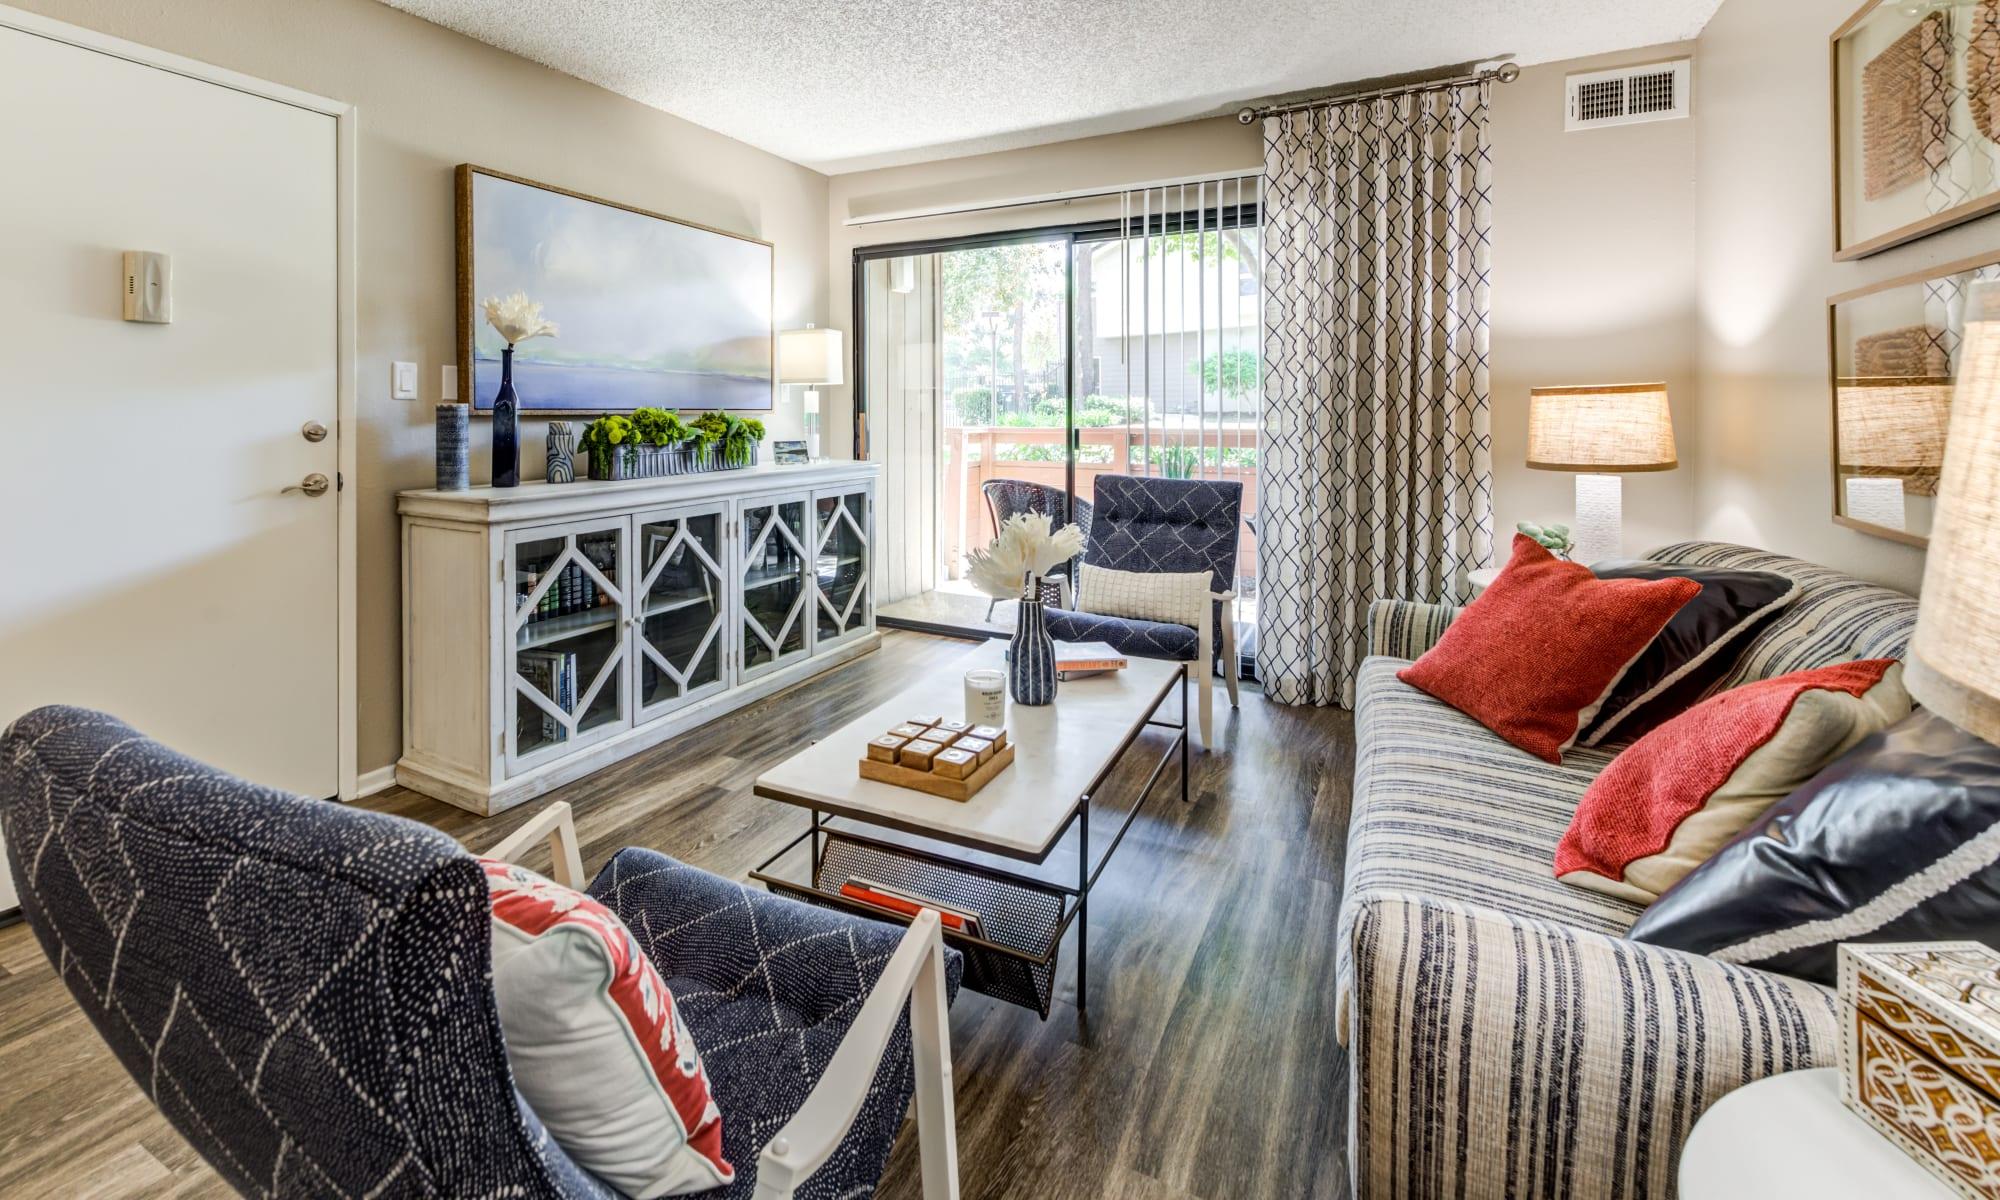 Photos of Parcwood Apartments in Corona, California